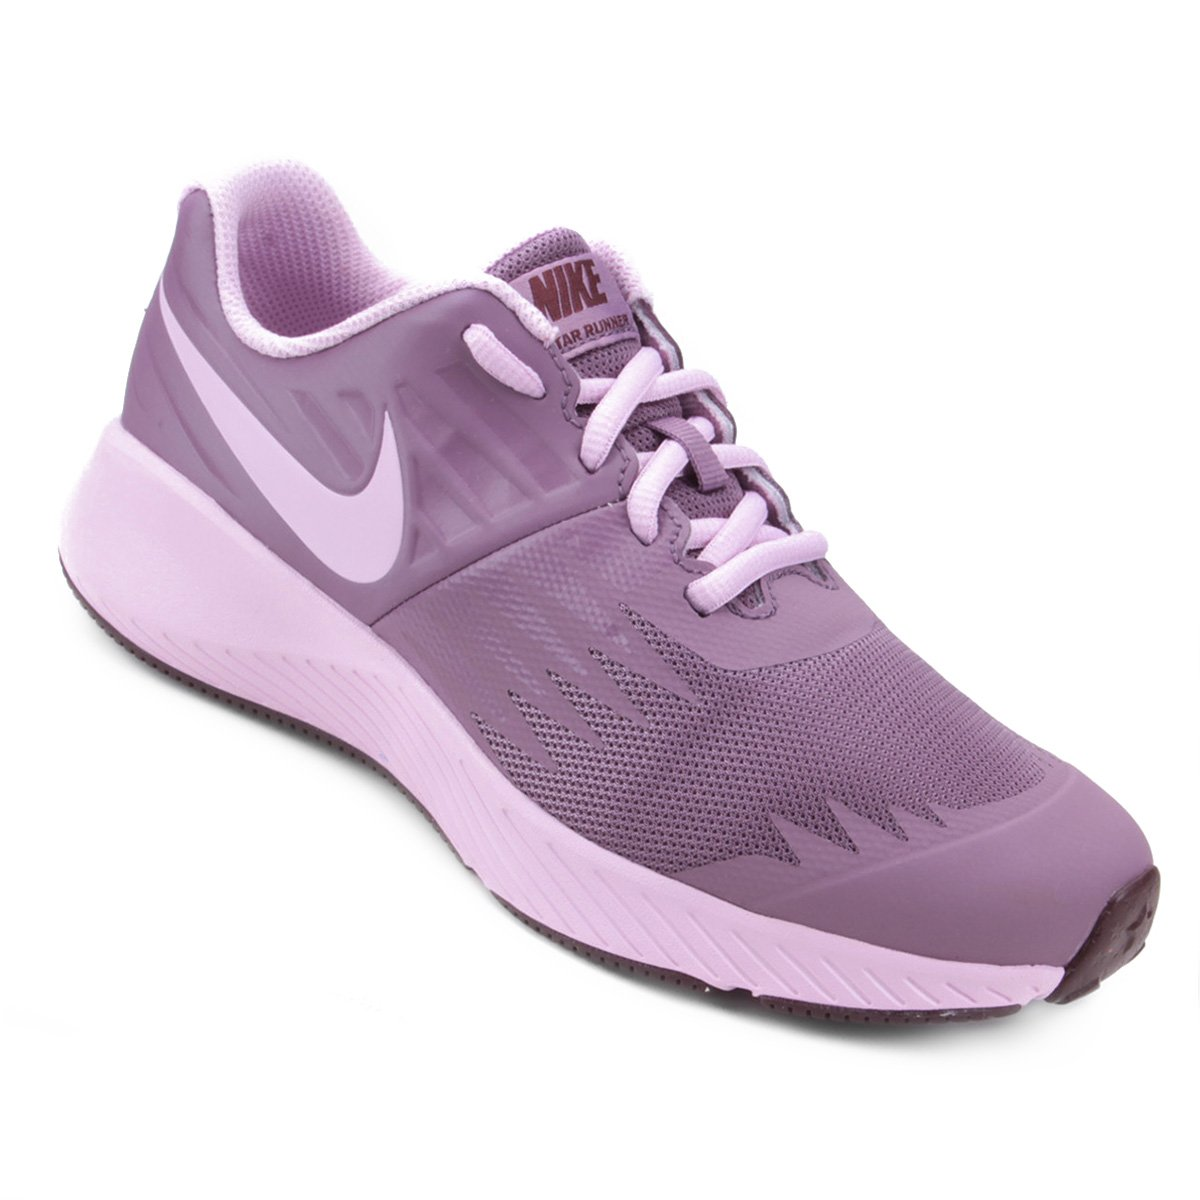 dc596ae794 Tênis Infantil Nike Star Runner - Roxo | Shop Timão